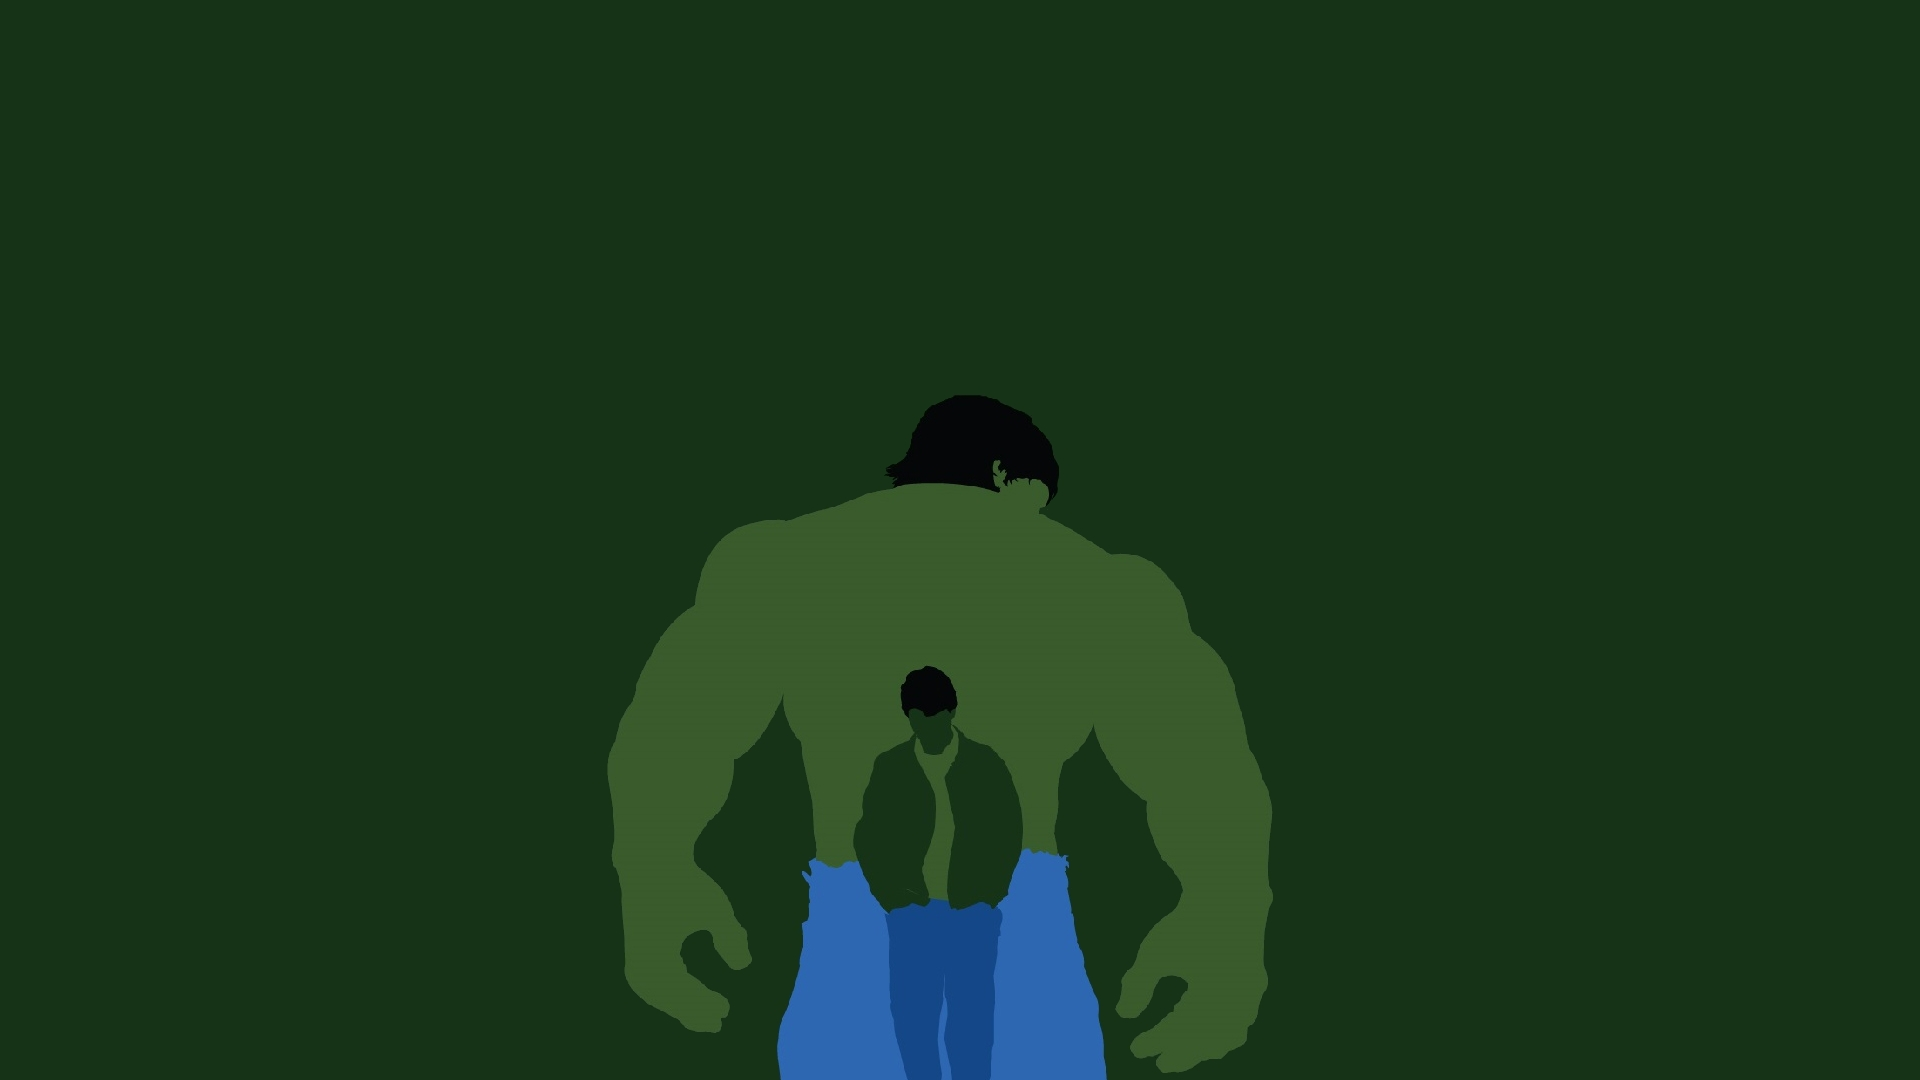 hulk wallpaper iphone 4